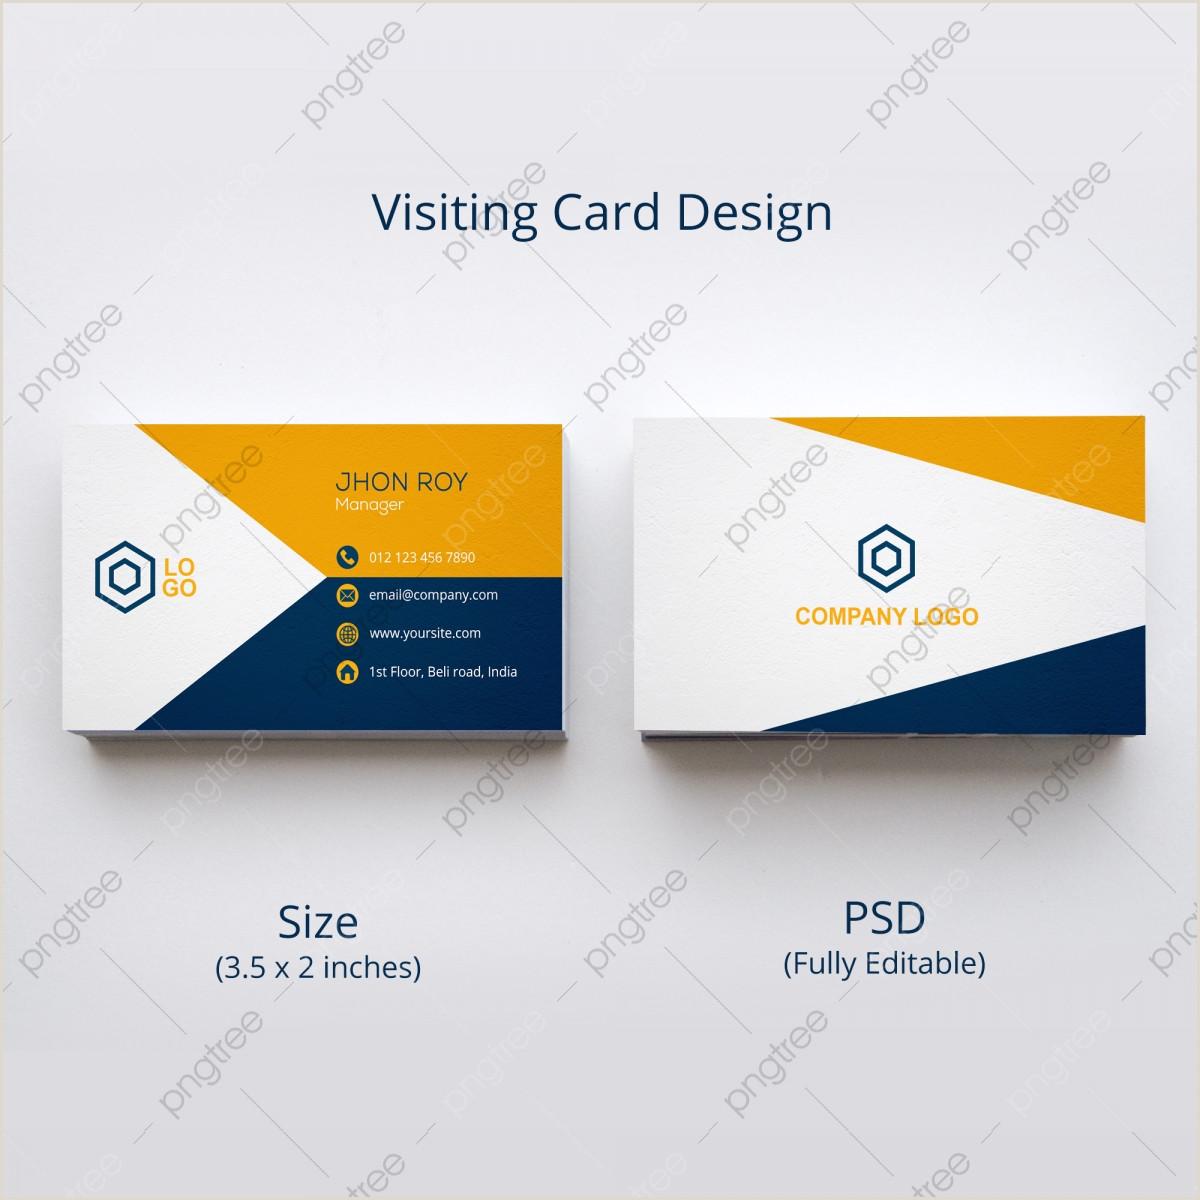 Visiting Cards Designs Visiting Card Design Png